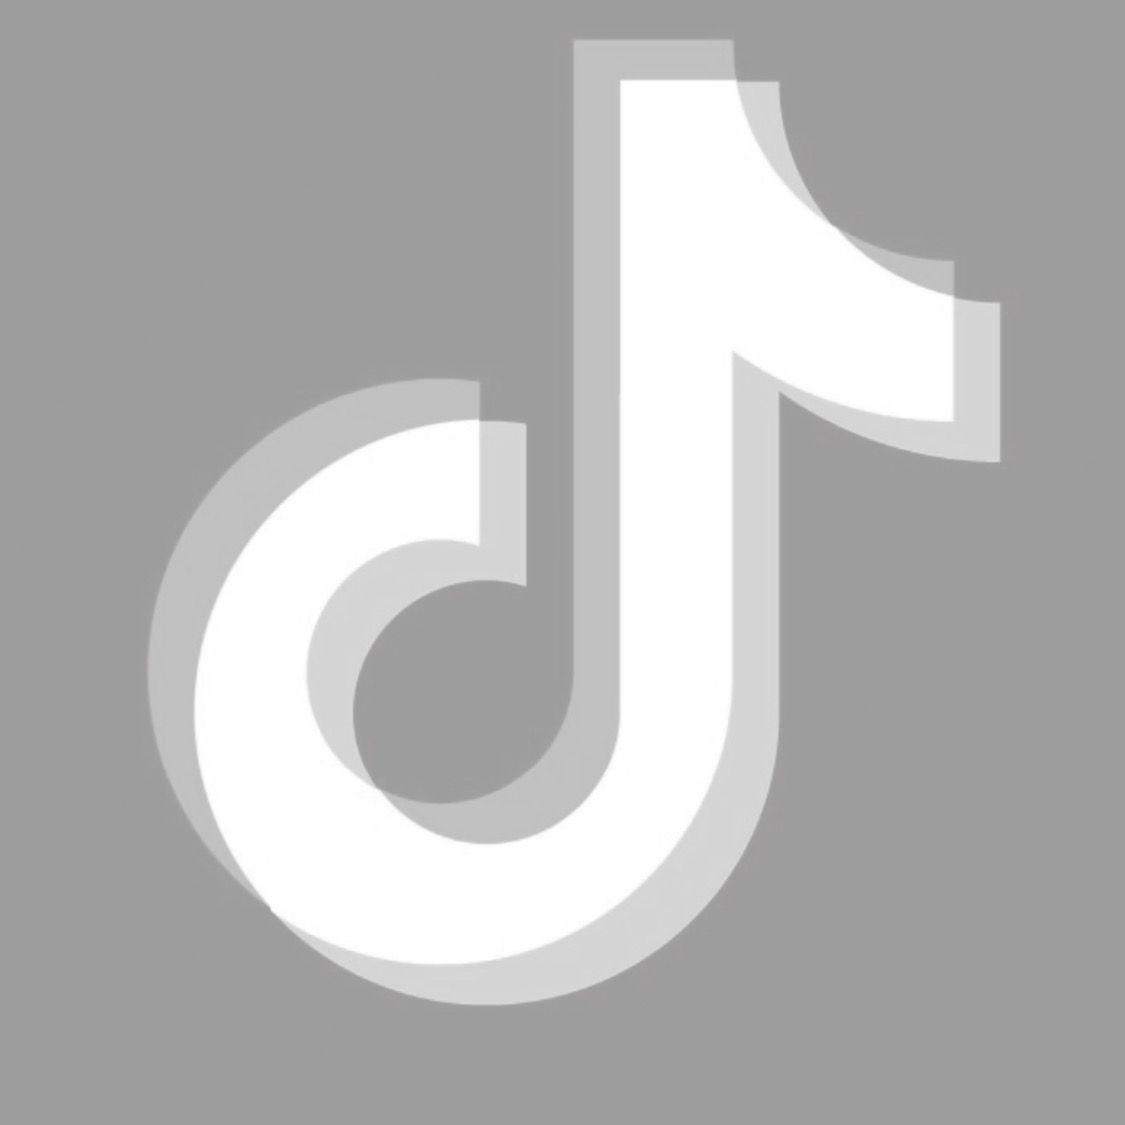 Tiktok White App Logo Aesthetic App Logo Iphone Photo App Ios App Iphone